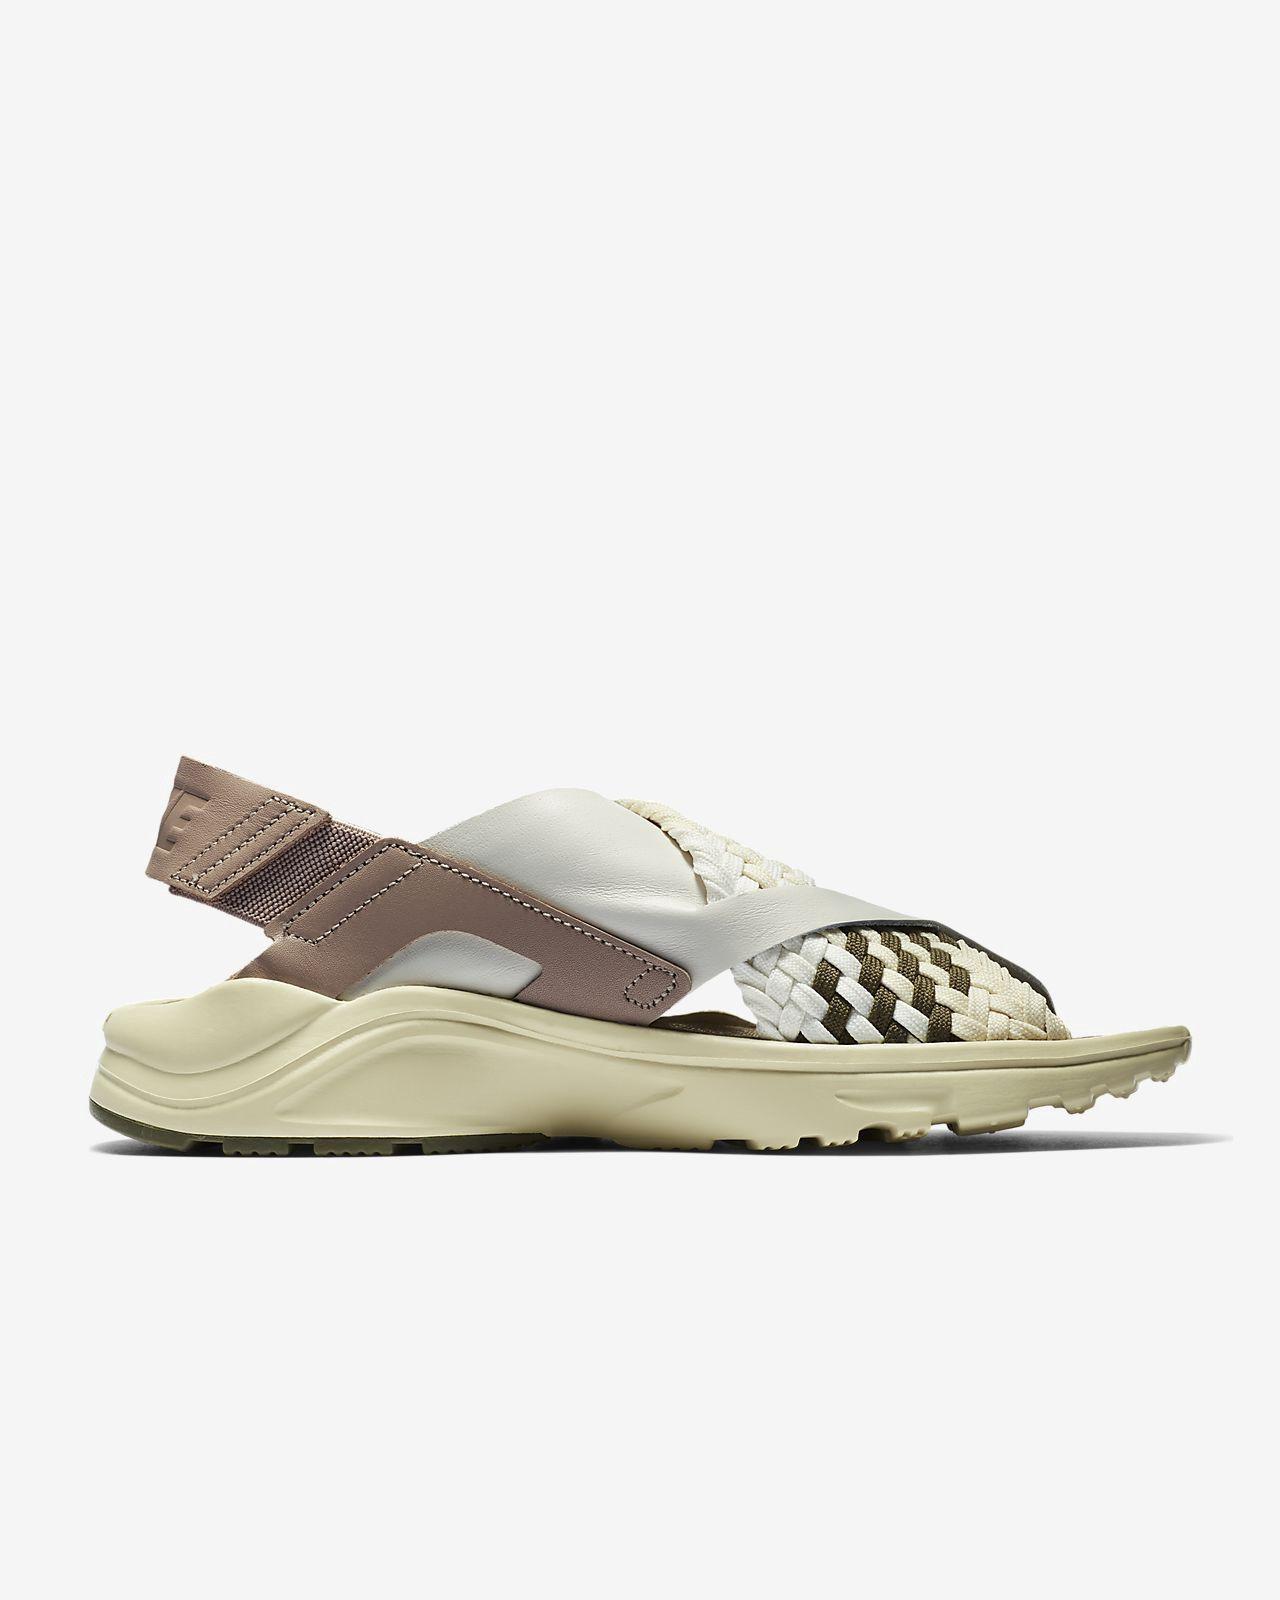 451c887560f0 Nike Air Huarache Ultra Women s Sandal - 11